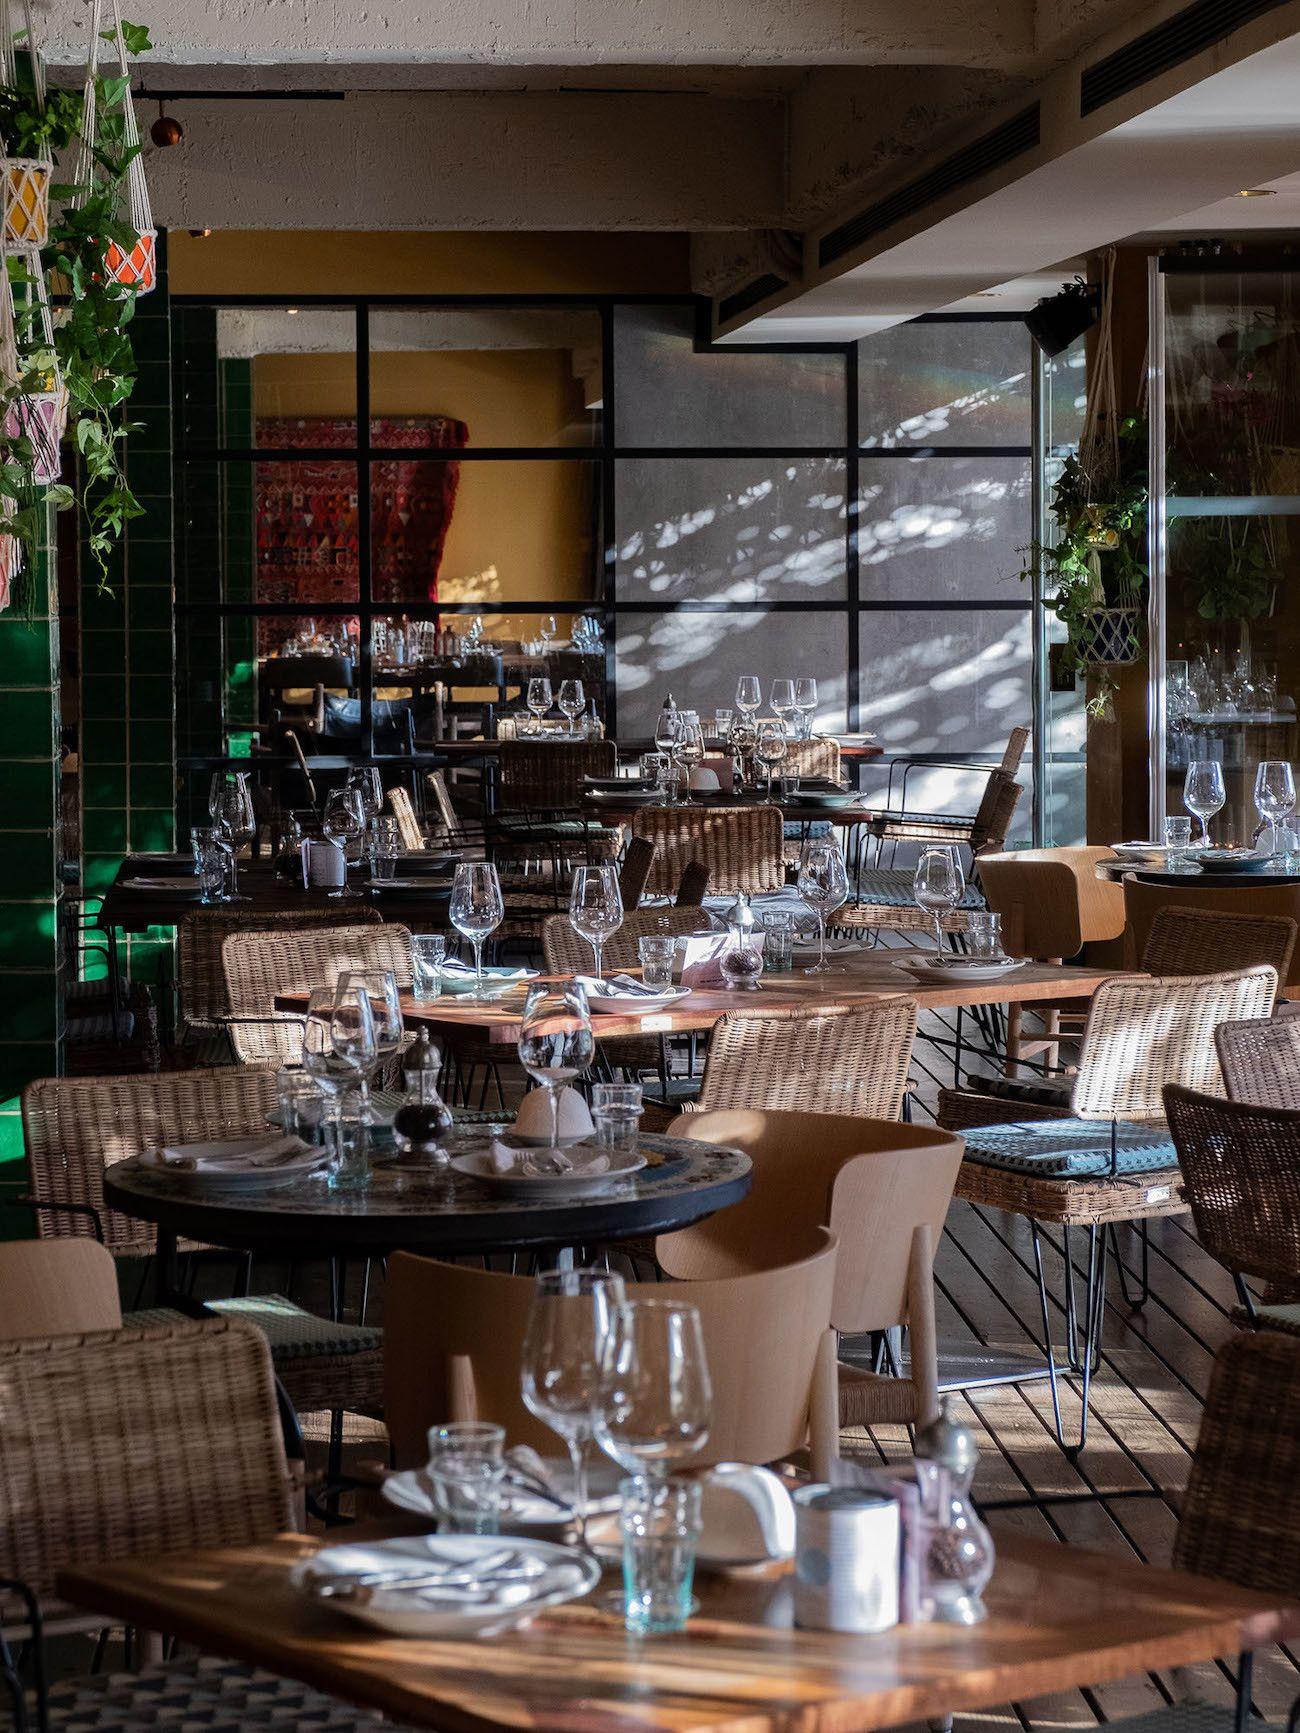 Foodblog About Fuel, Bikini Island & Mountain Hotels, Neni Restaurant